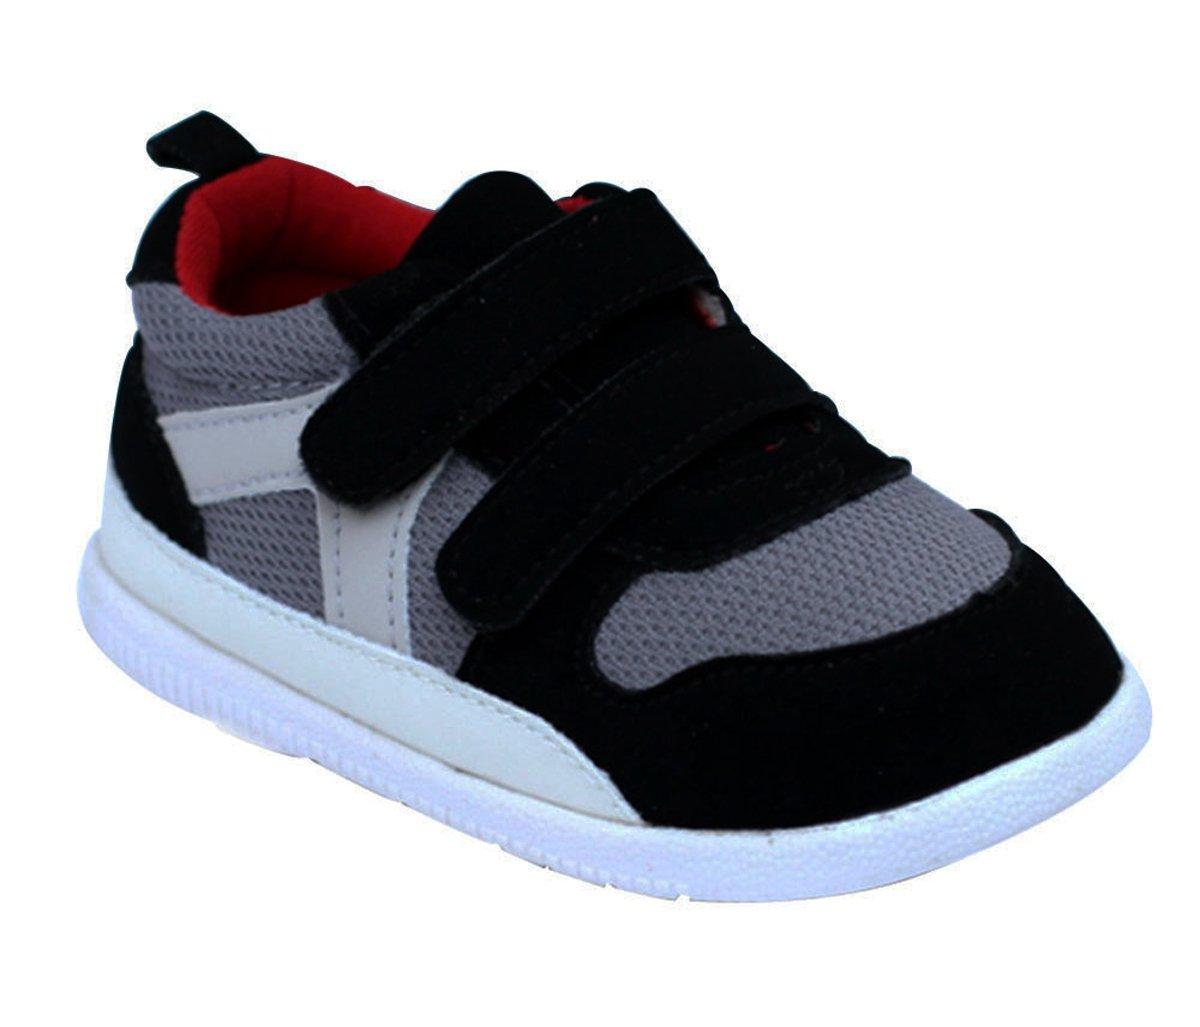 Kuner Baby Boys Girls Cotton Rubber Sloe Outdoor Sneaker First Walkers Shoes (13.5cm(12-18months), Black)